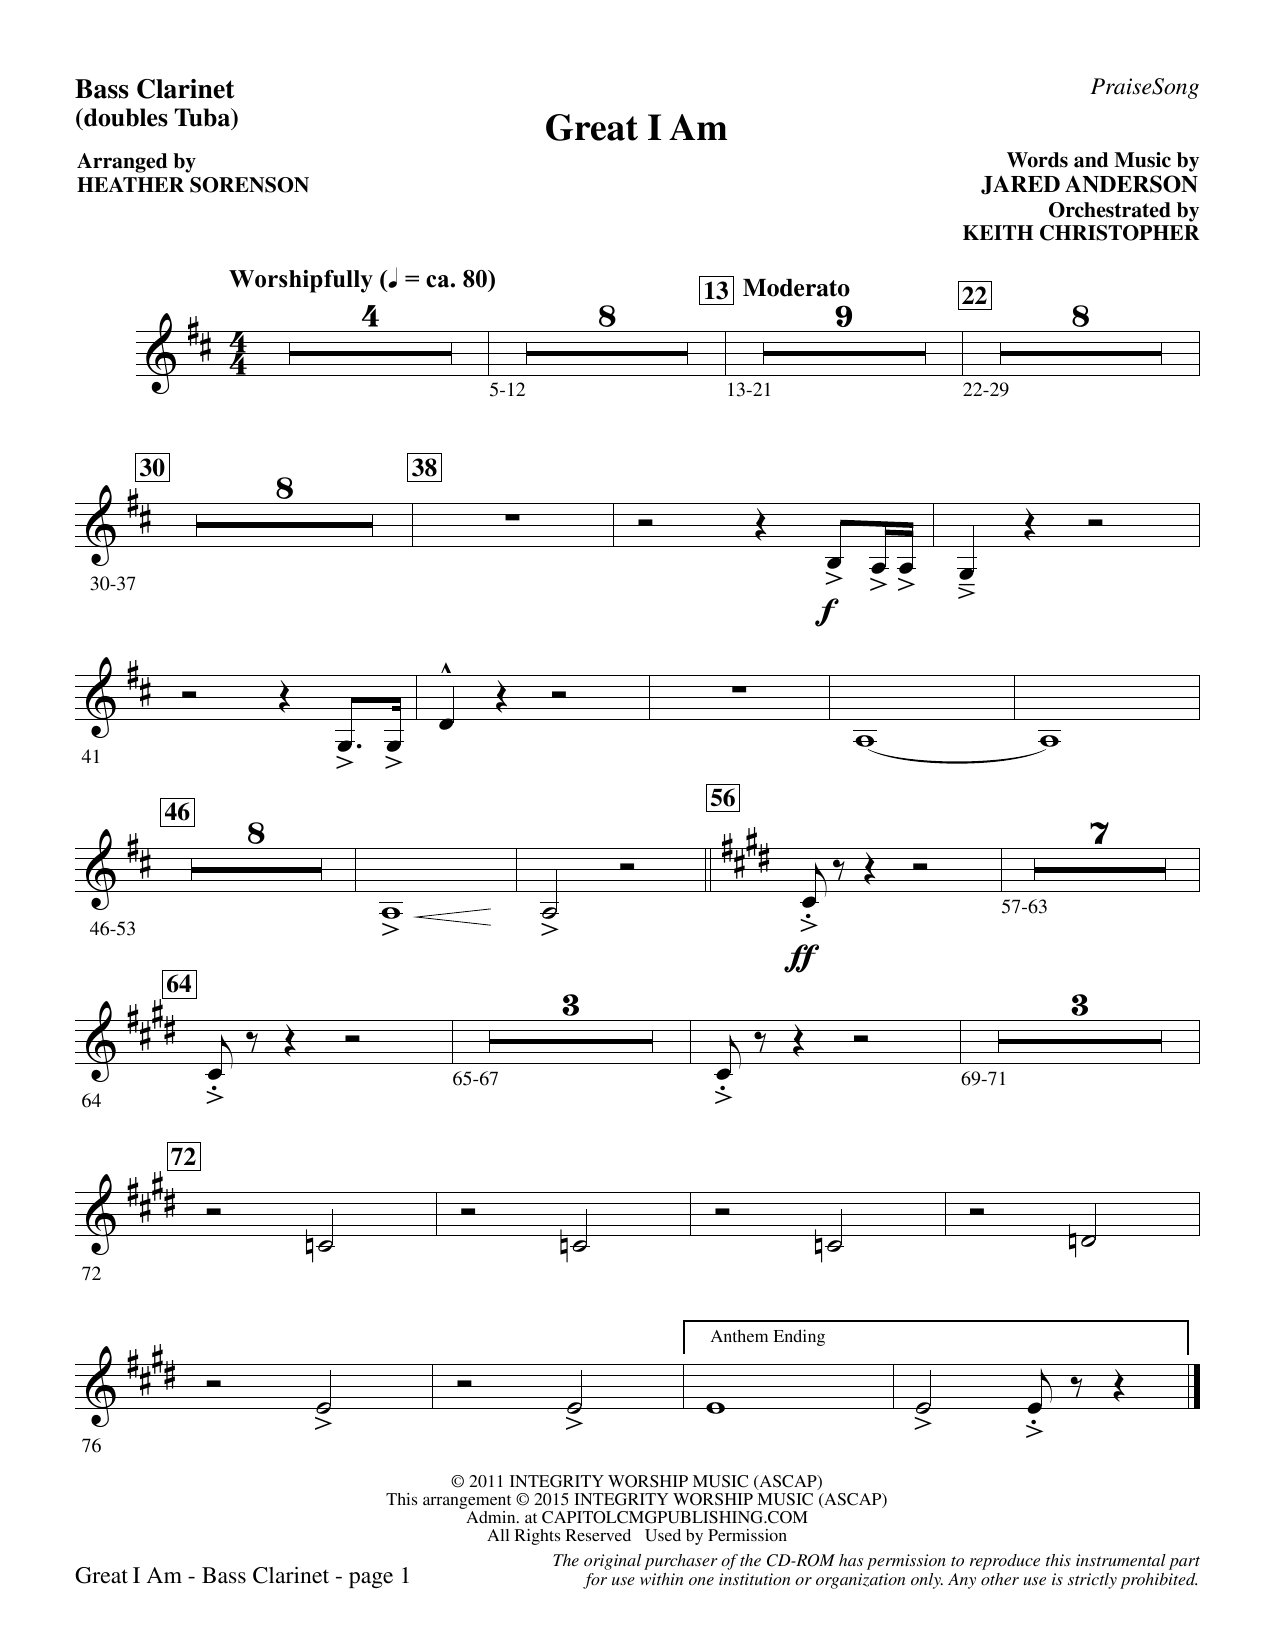 Great I Am - Bass Clarinet (sub. Tuba) sheet music